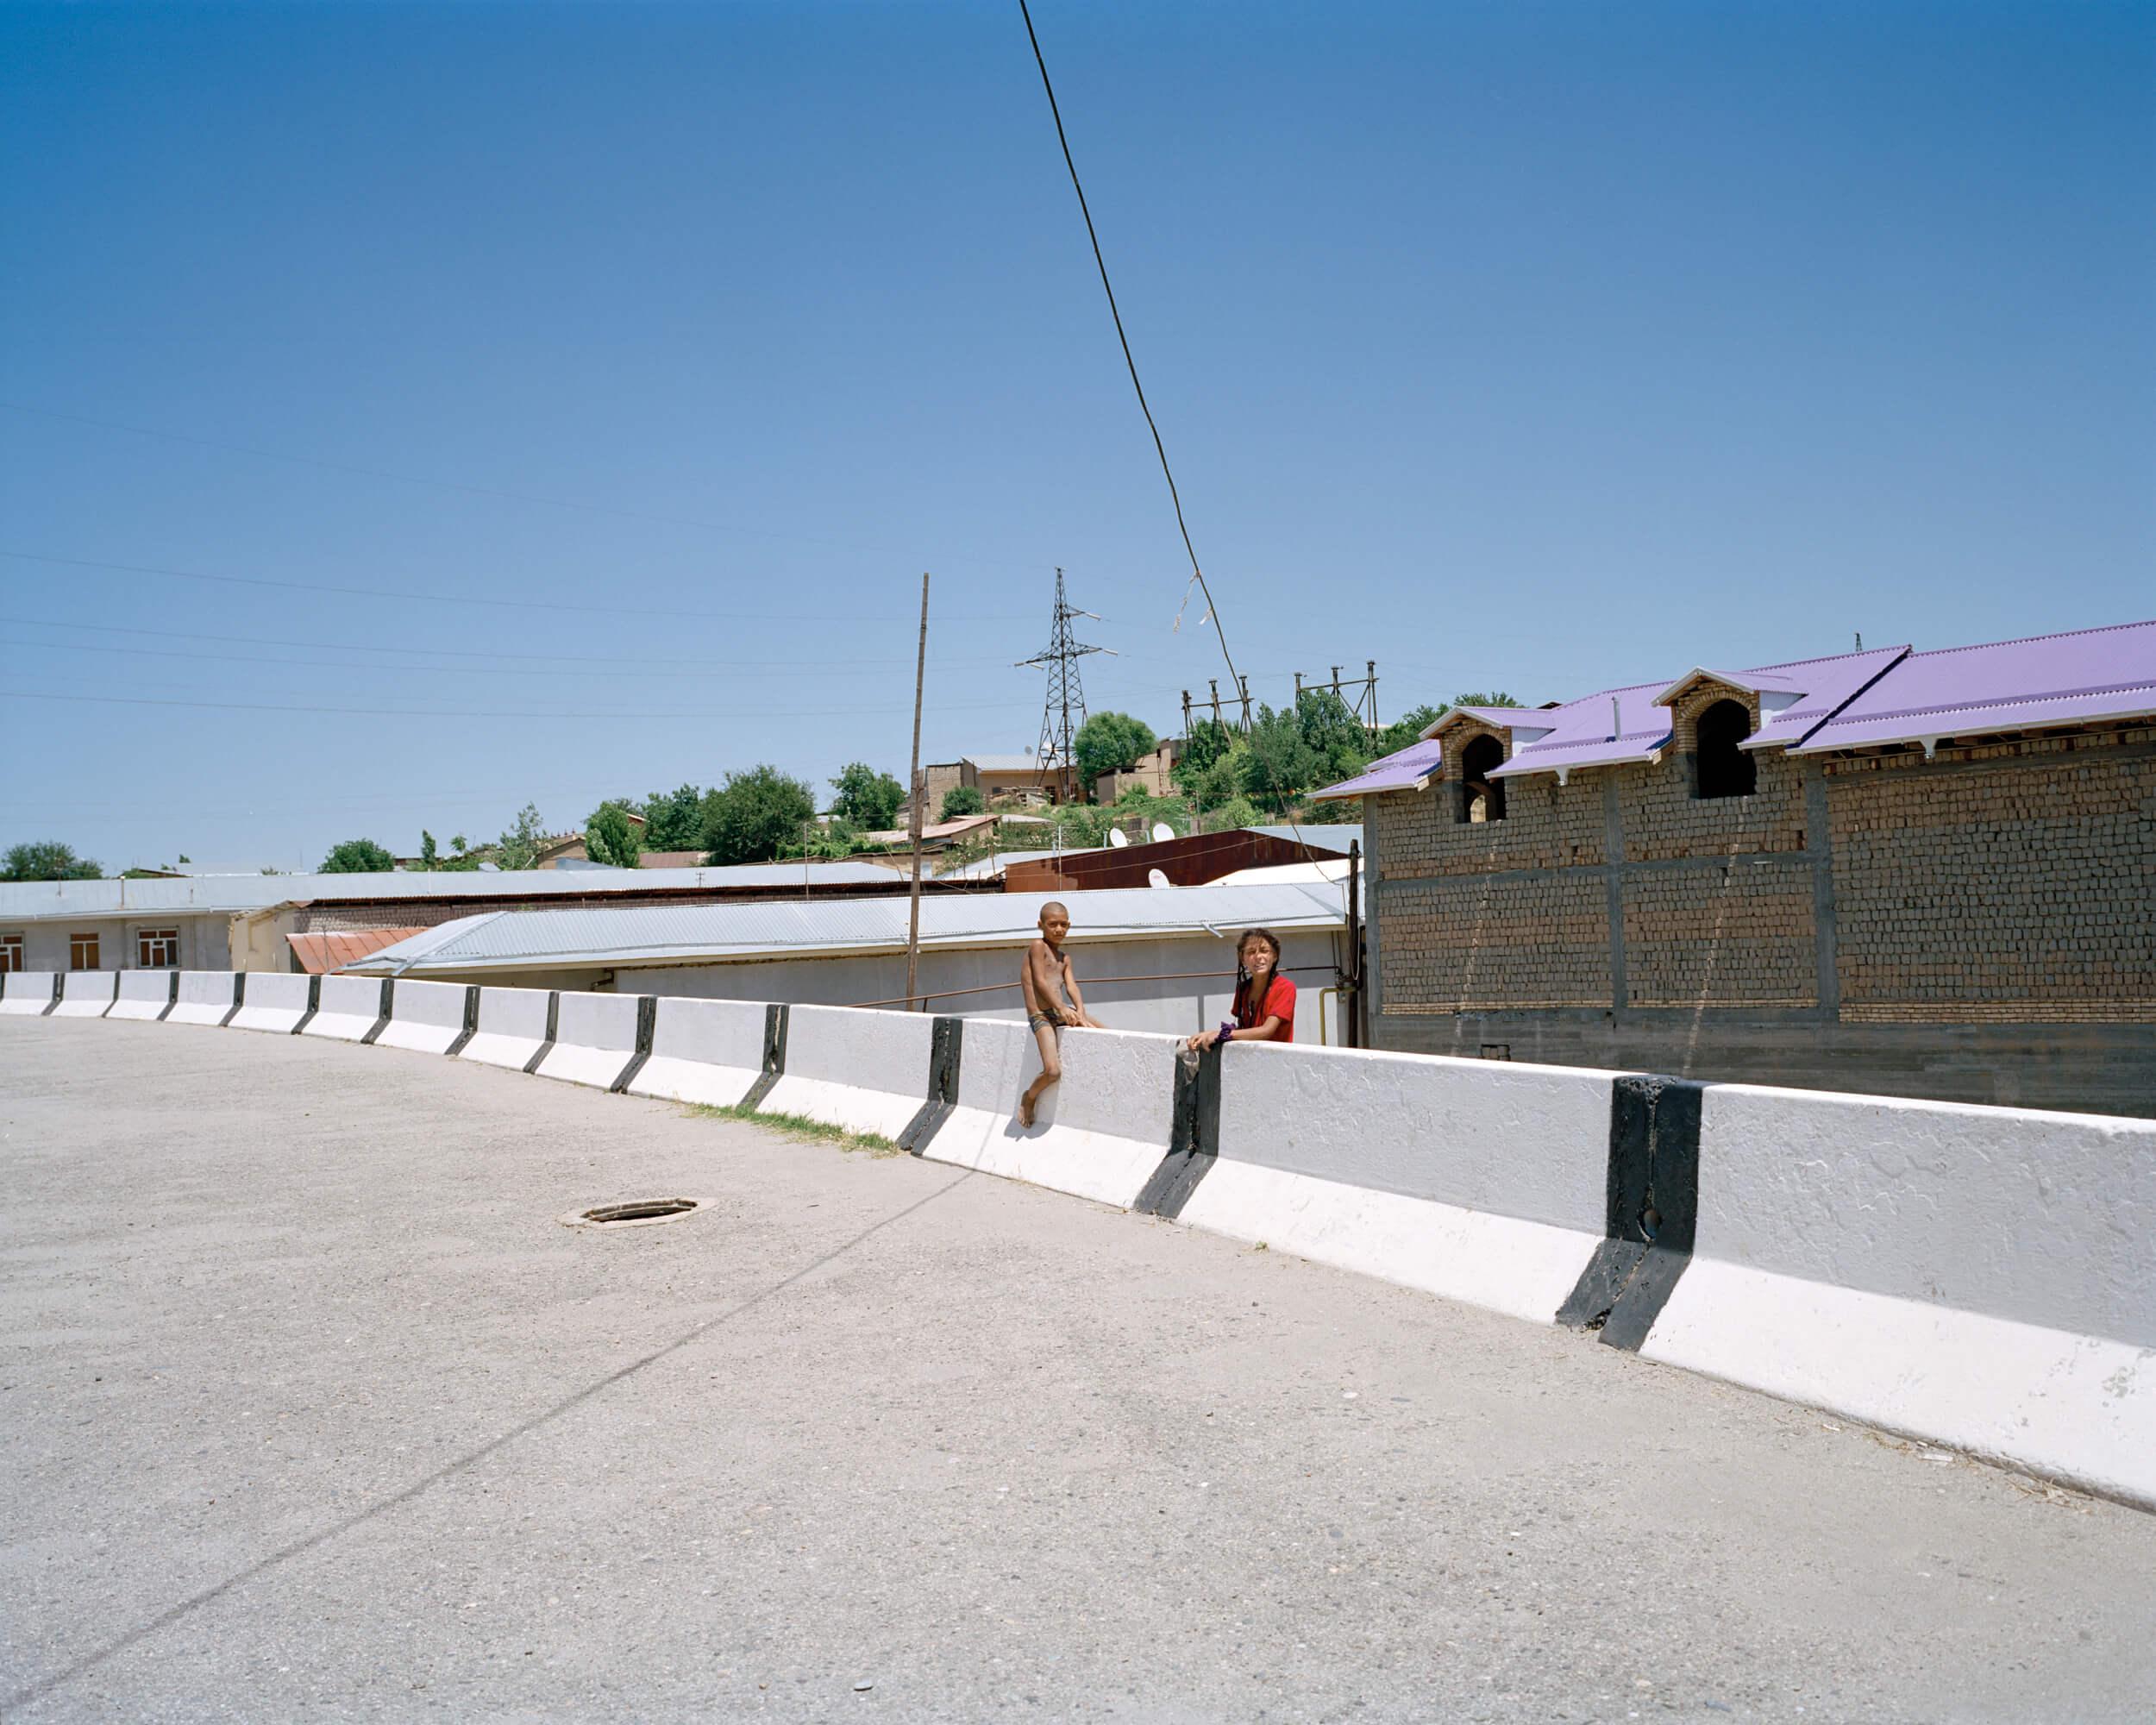 marco-barbieri-water-in-the-desert-27.jpg